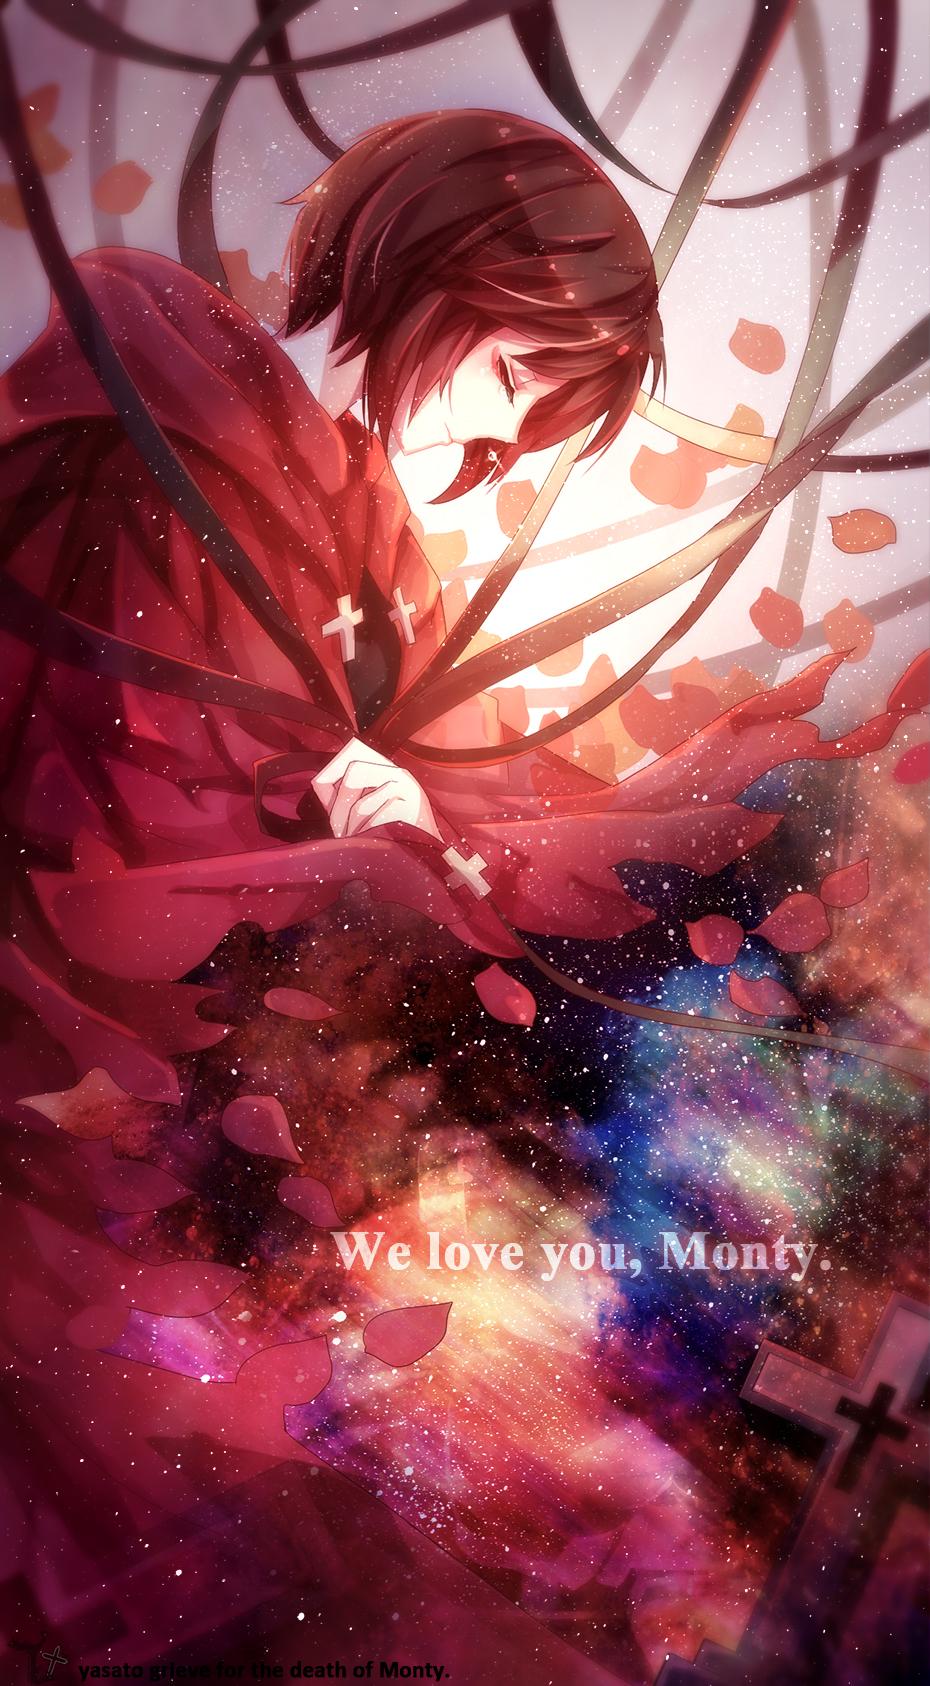 rwby monty oum page 14 of 100 zerochan anime image board